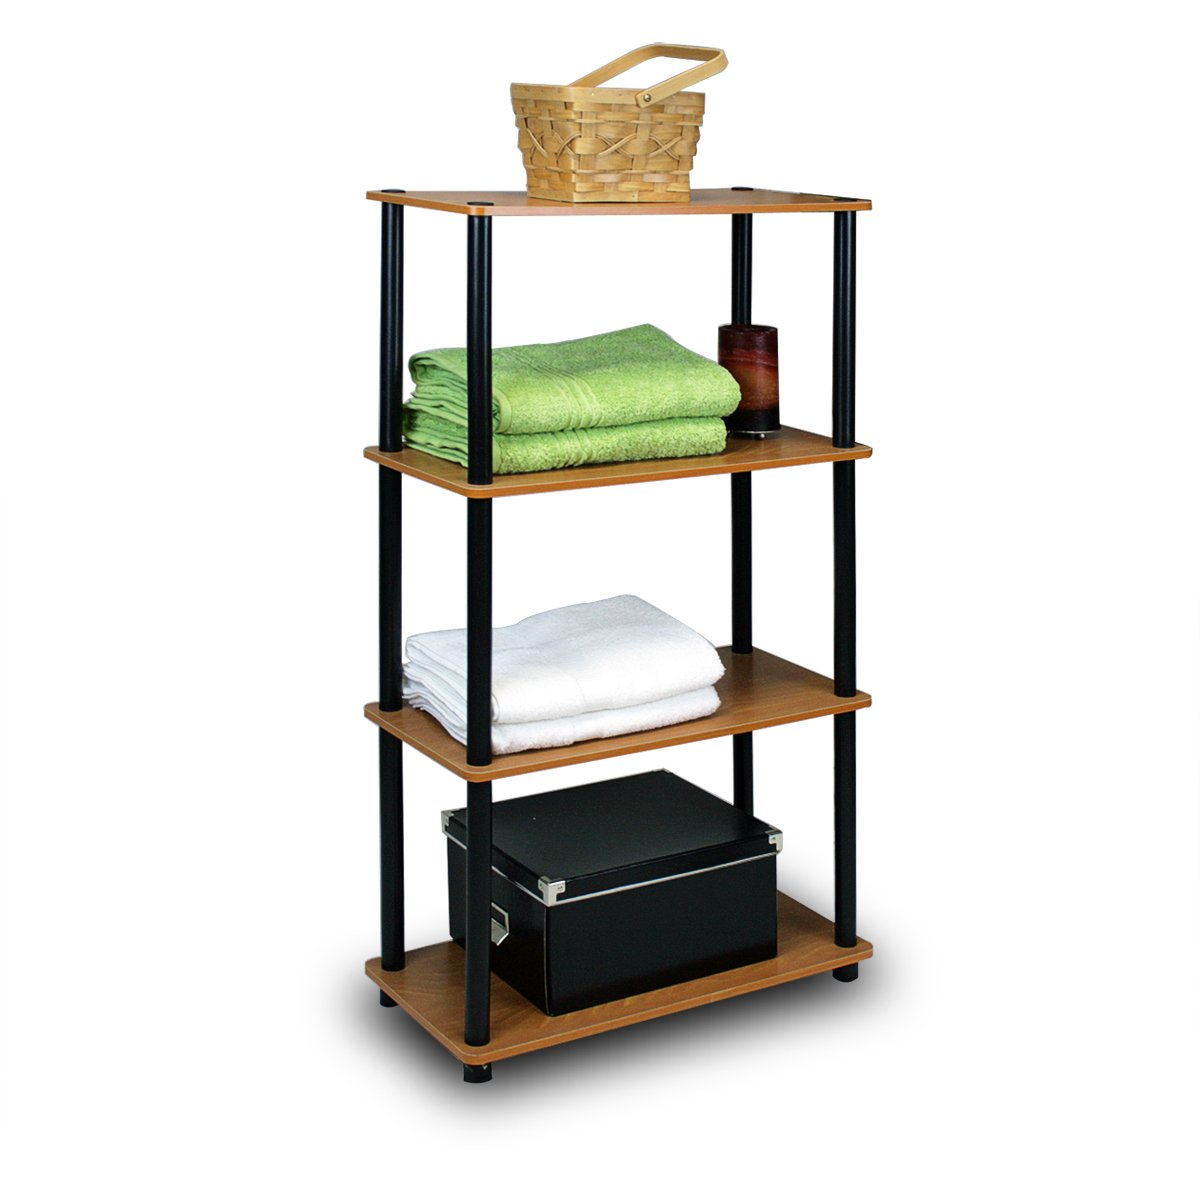 4 Tier Storage Shelf Display Rack For Bathroom Closet Home Office Living Room Ebay